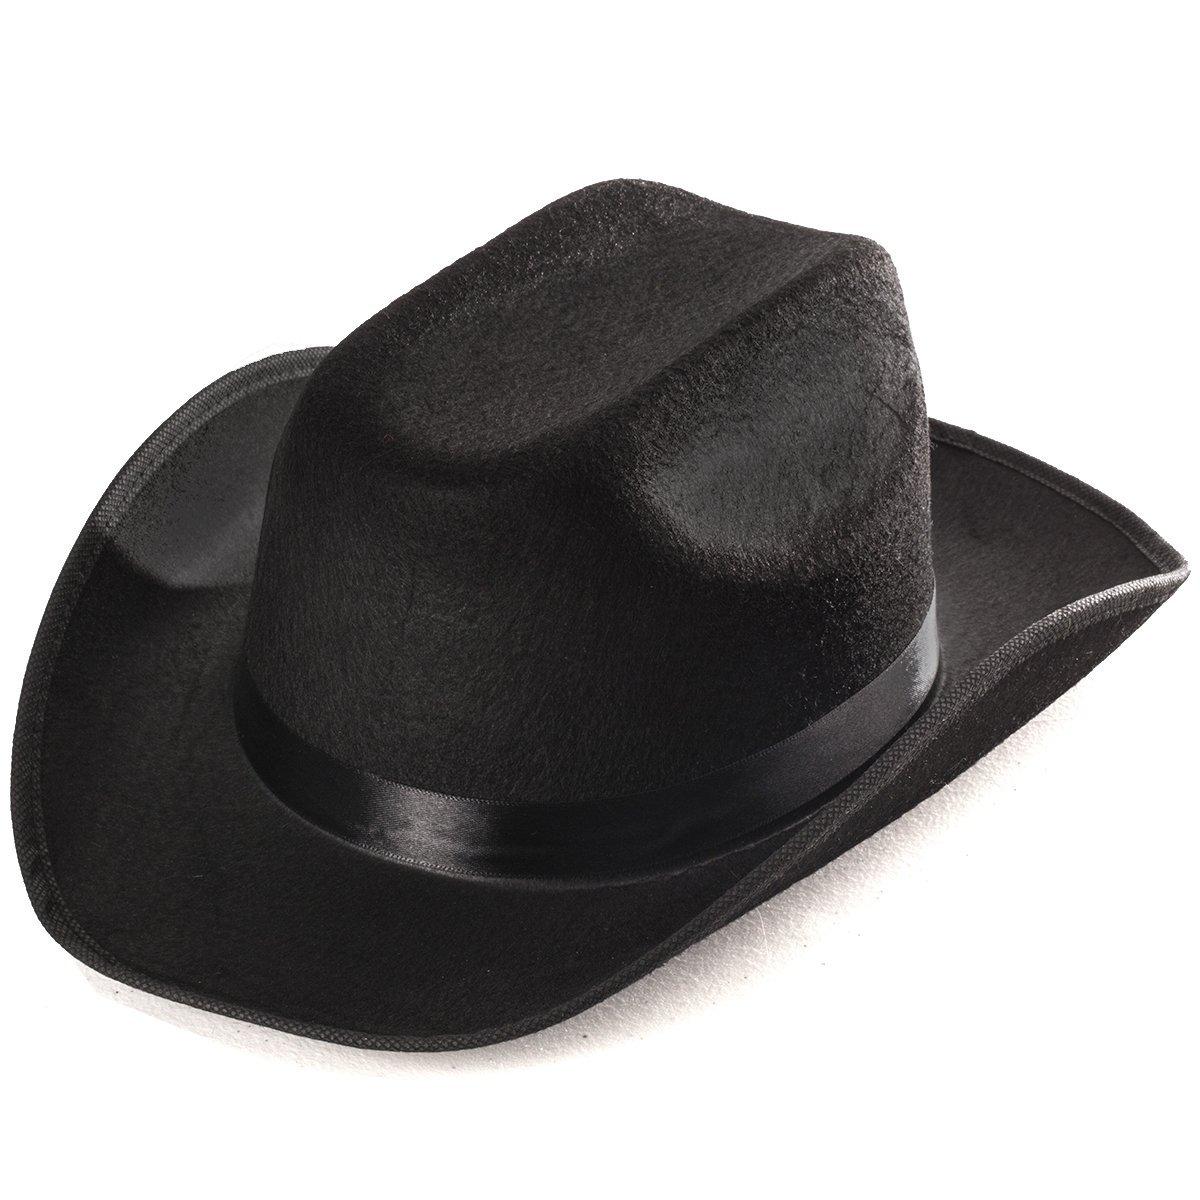 Funny Party Hats Black Cowboy Hat - Cowboy Hats - Western Hat - Unisex  Adult Cowboy 77c9096e6f7